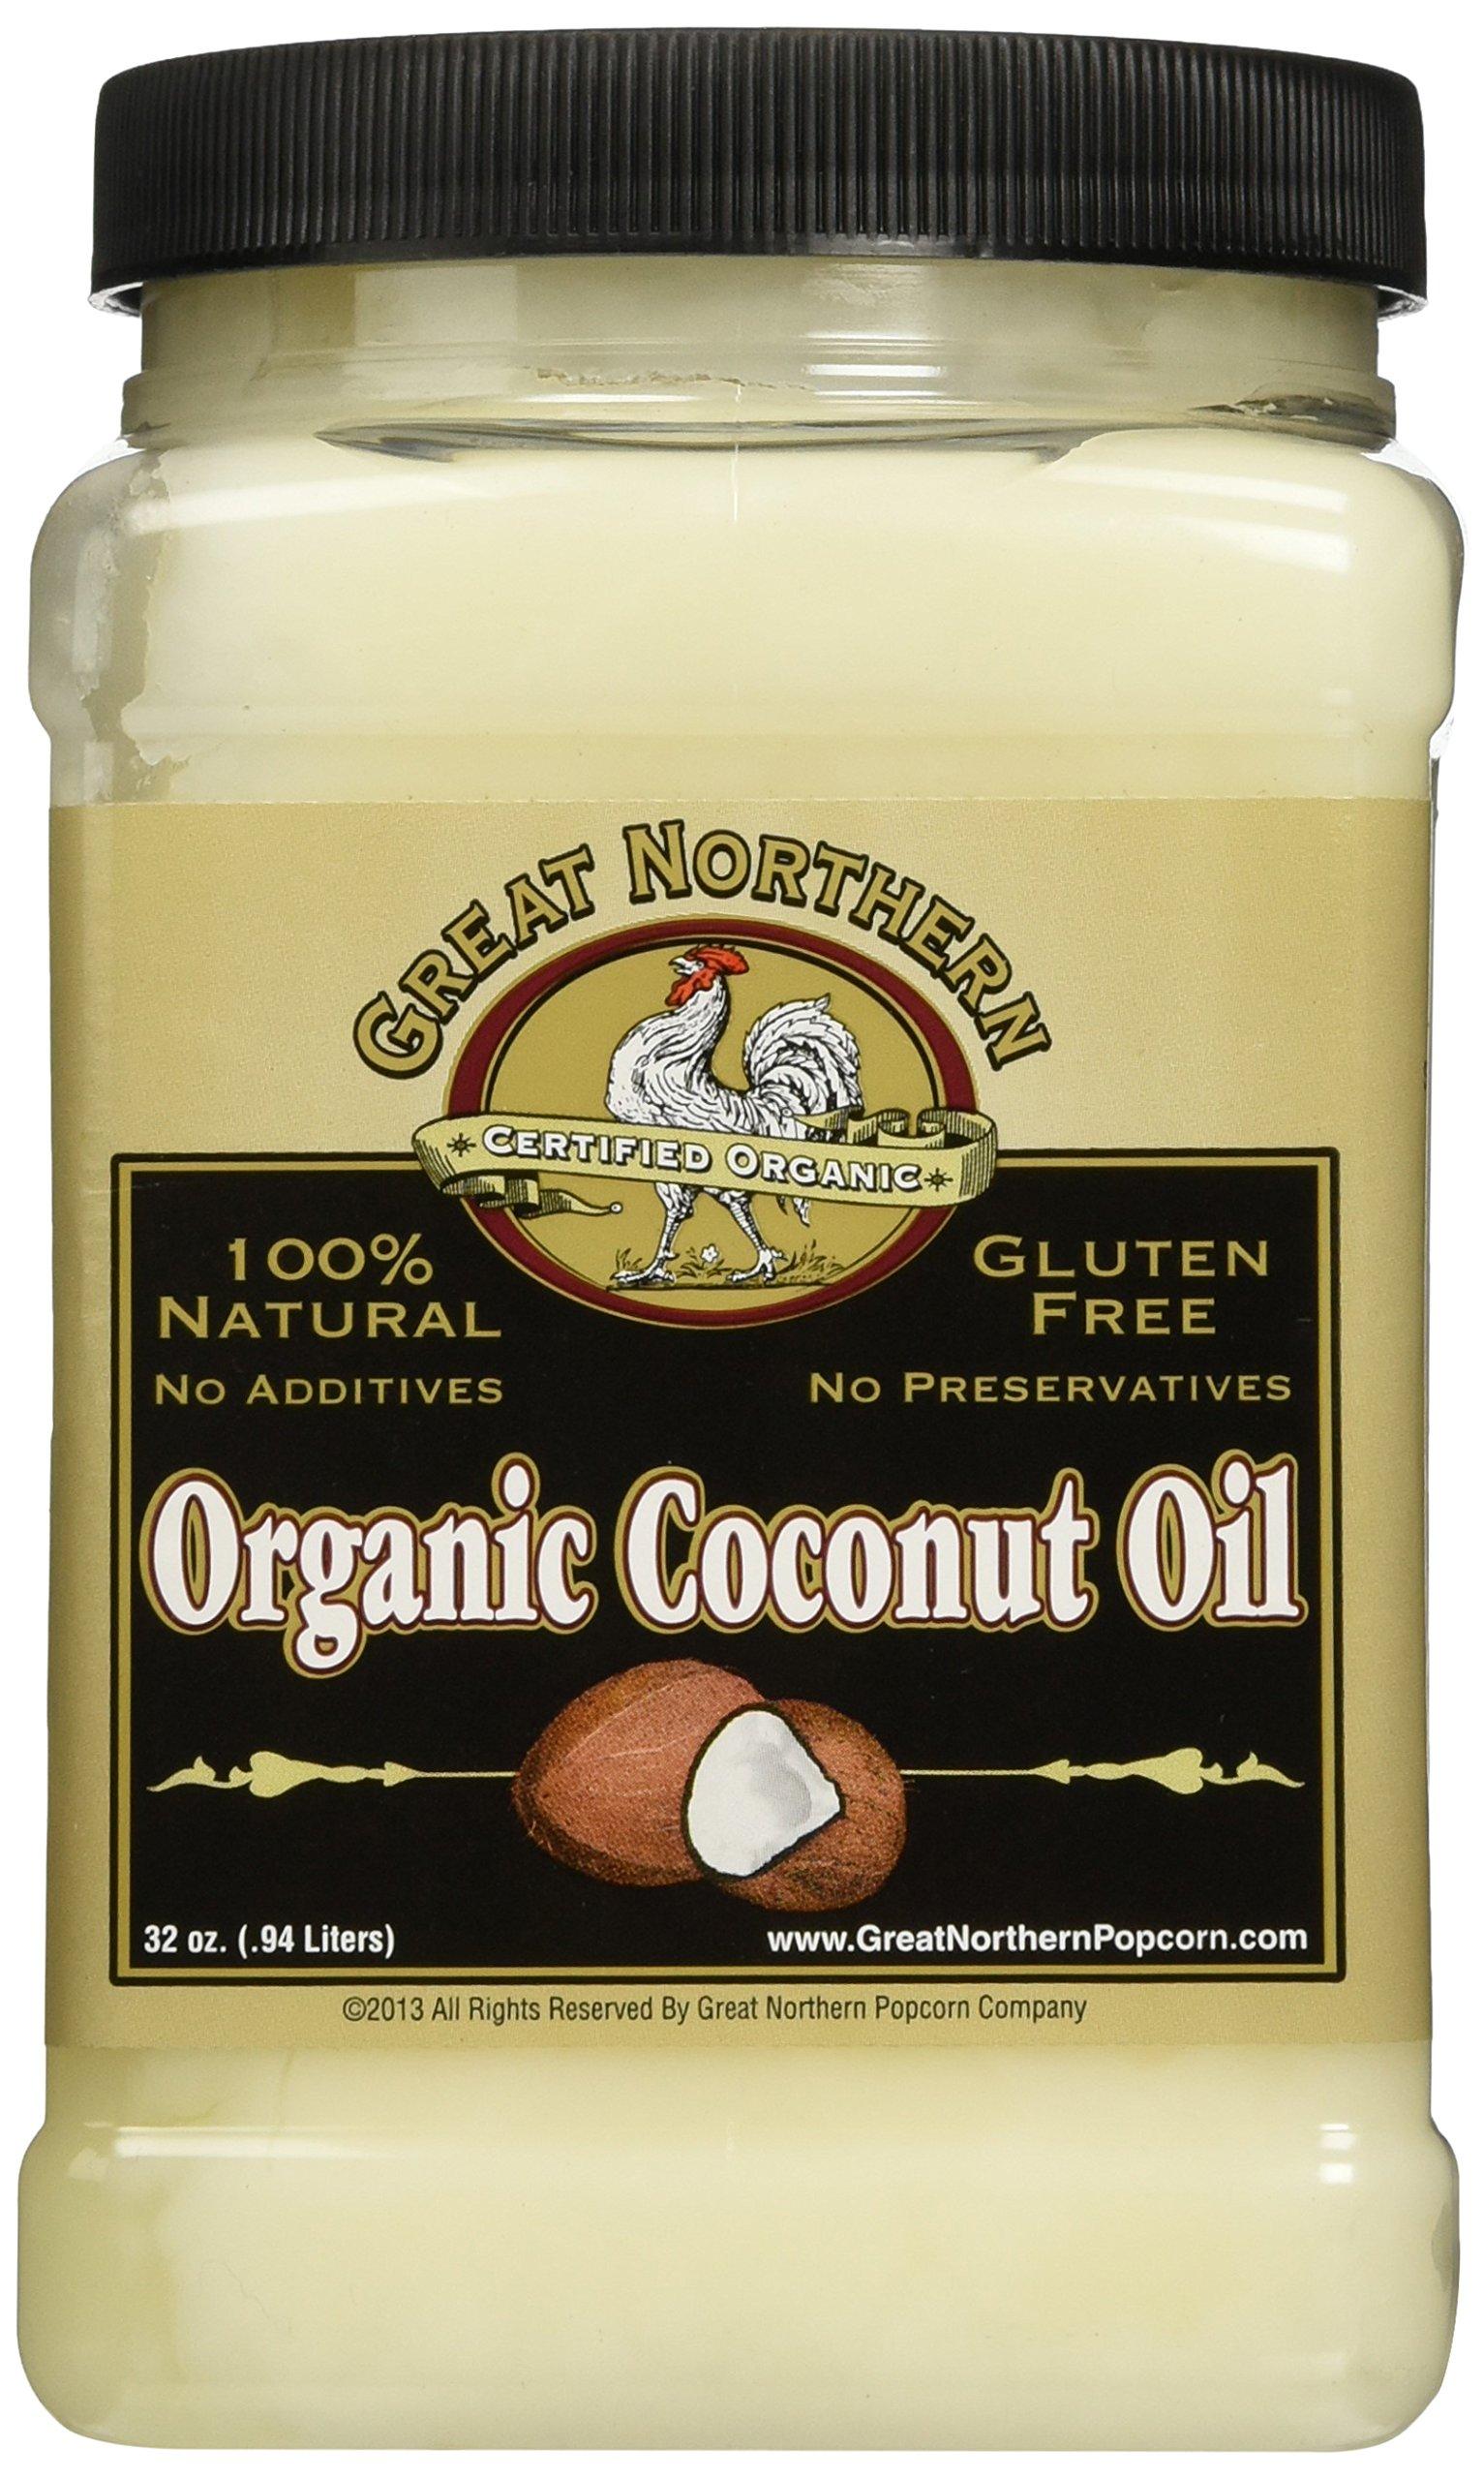 Great Northern Popcorn Premium Organic Coconut Oil, 32 Ounces by Great Northern Popcorn Company